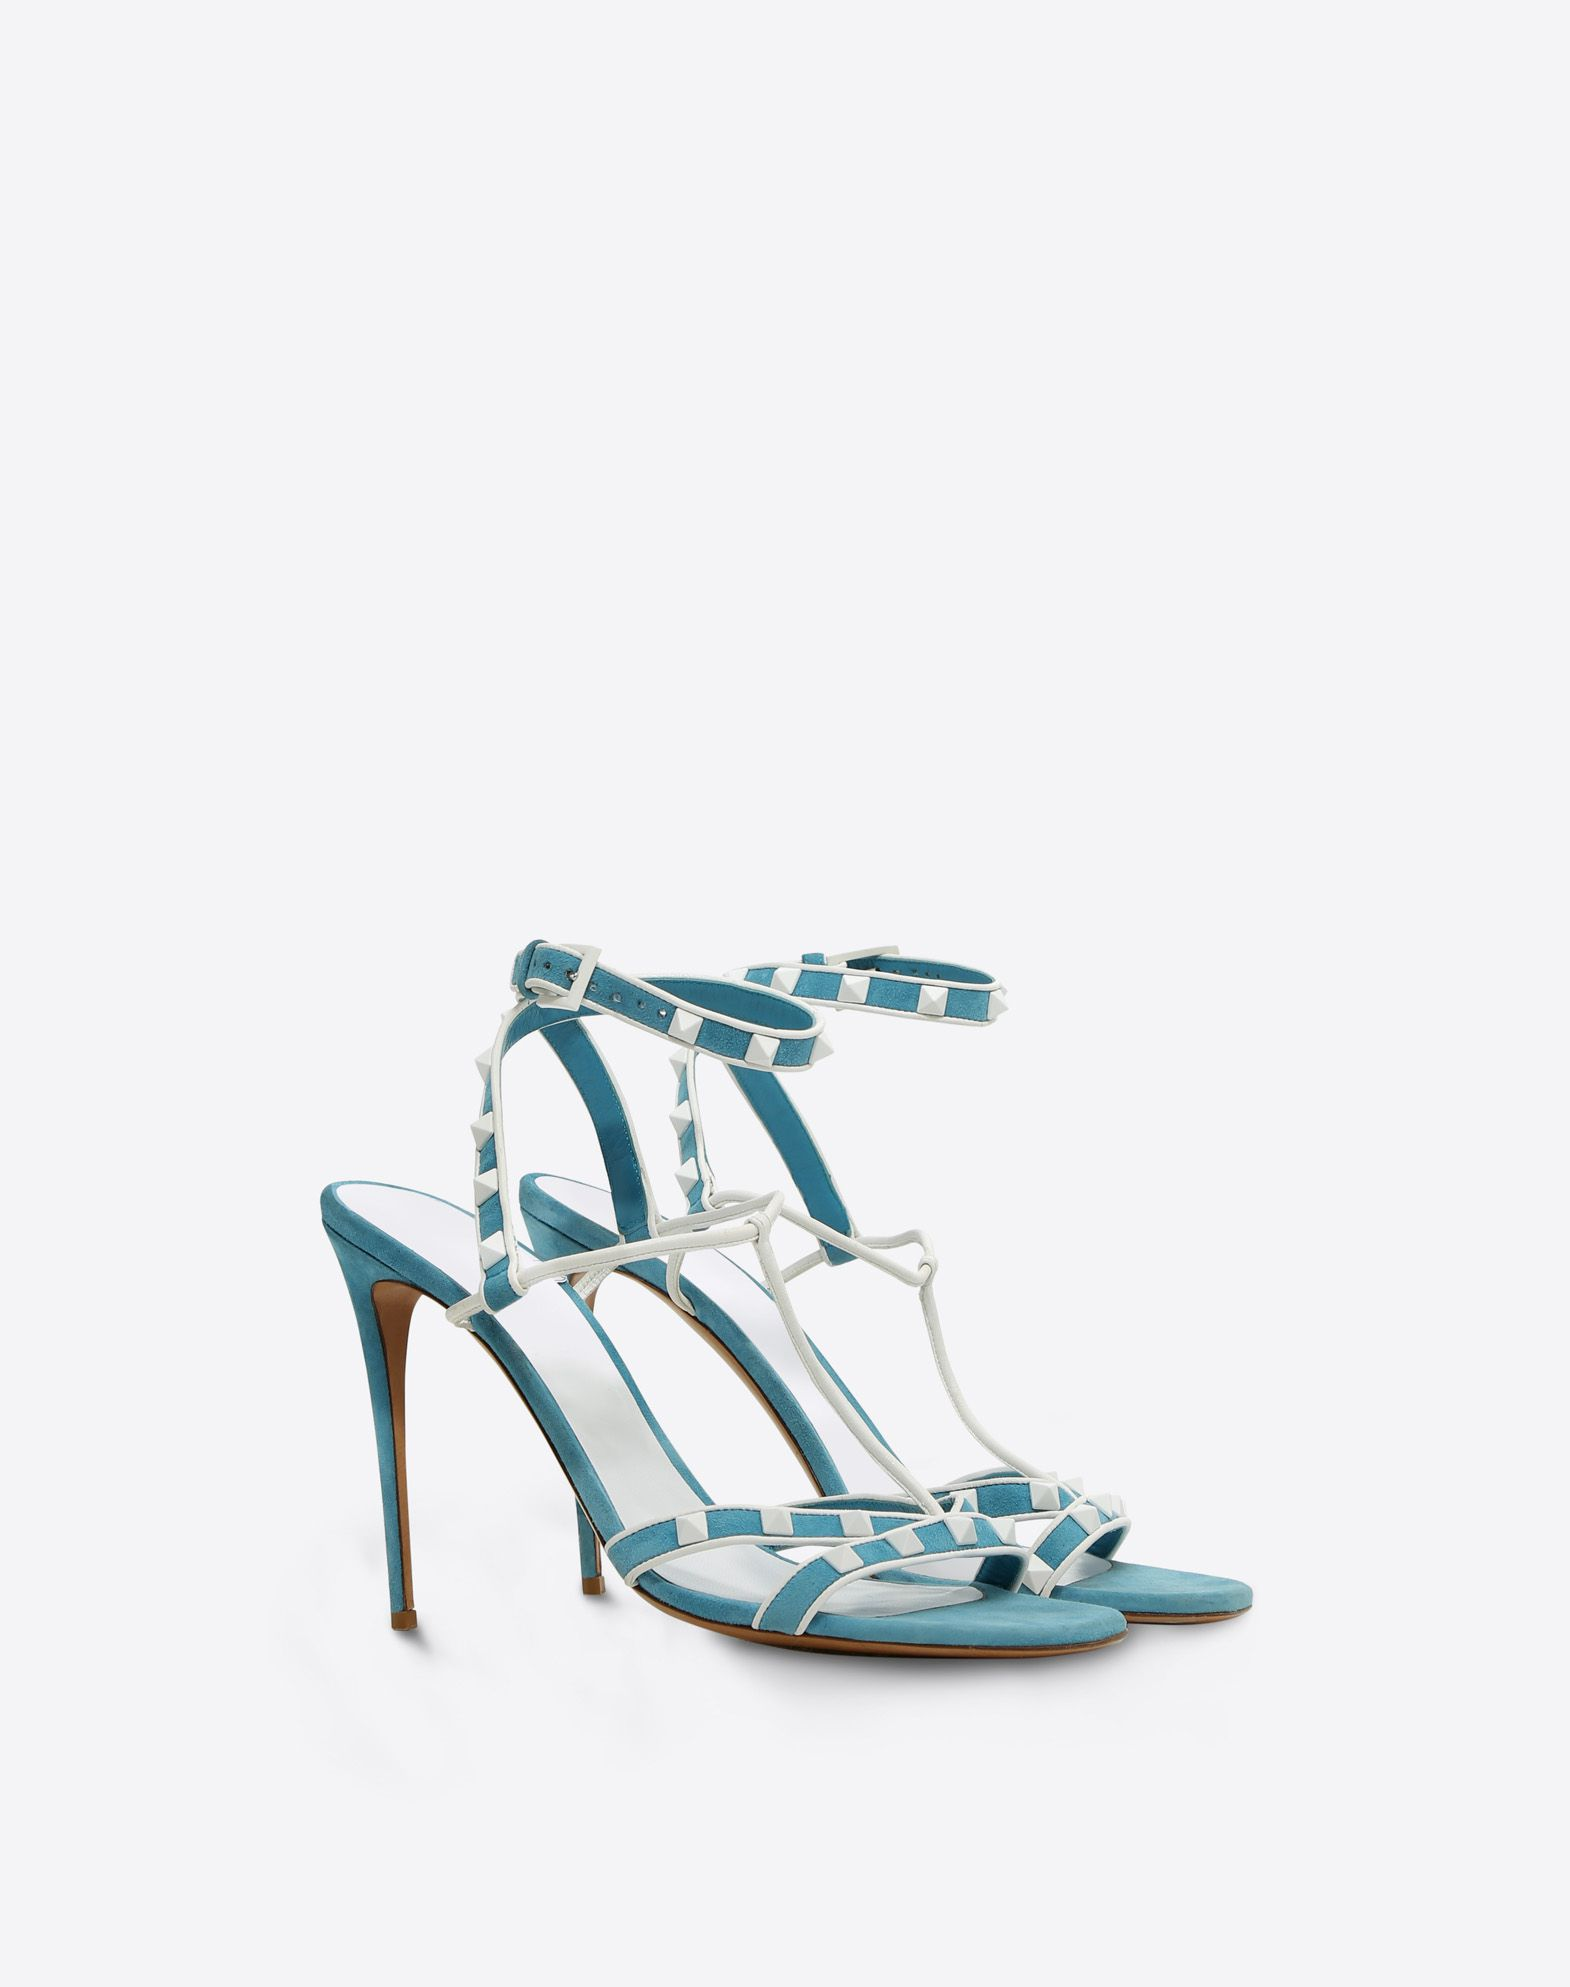 Valentino Garavani Free Rockstud suede sandals Purchase Cheap Price Buy Cheap Wide Range Of tS2bce